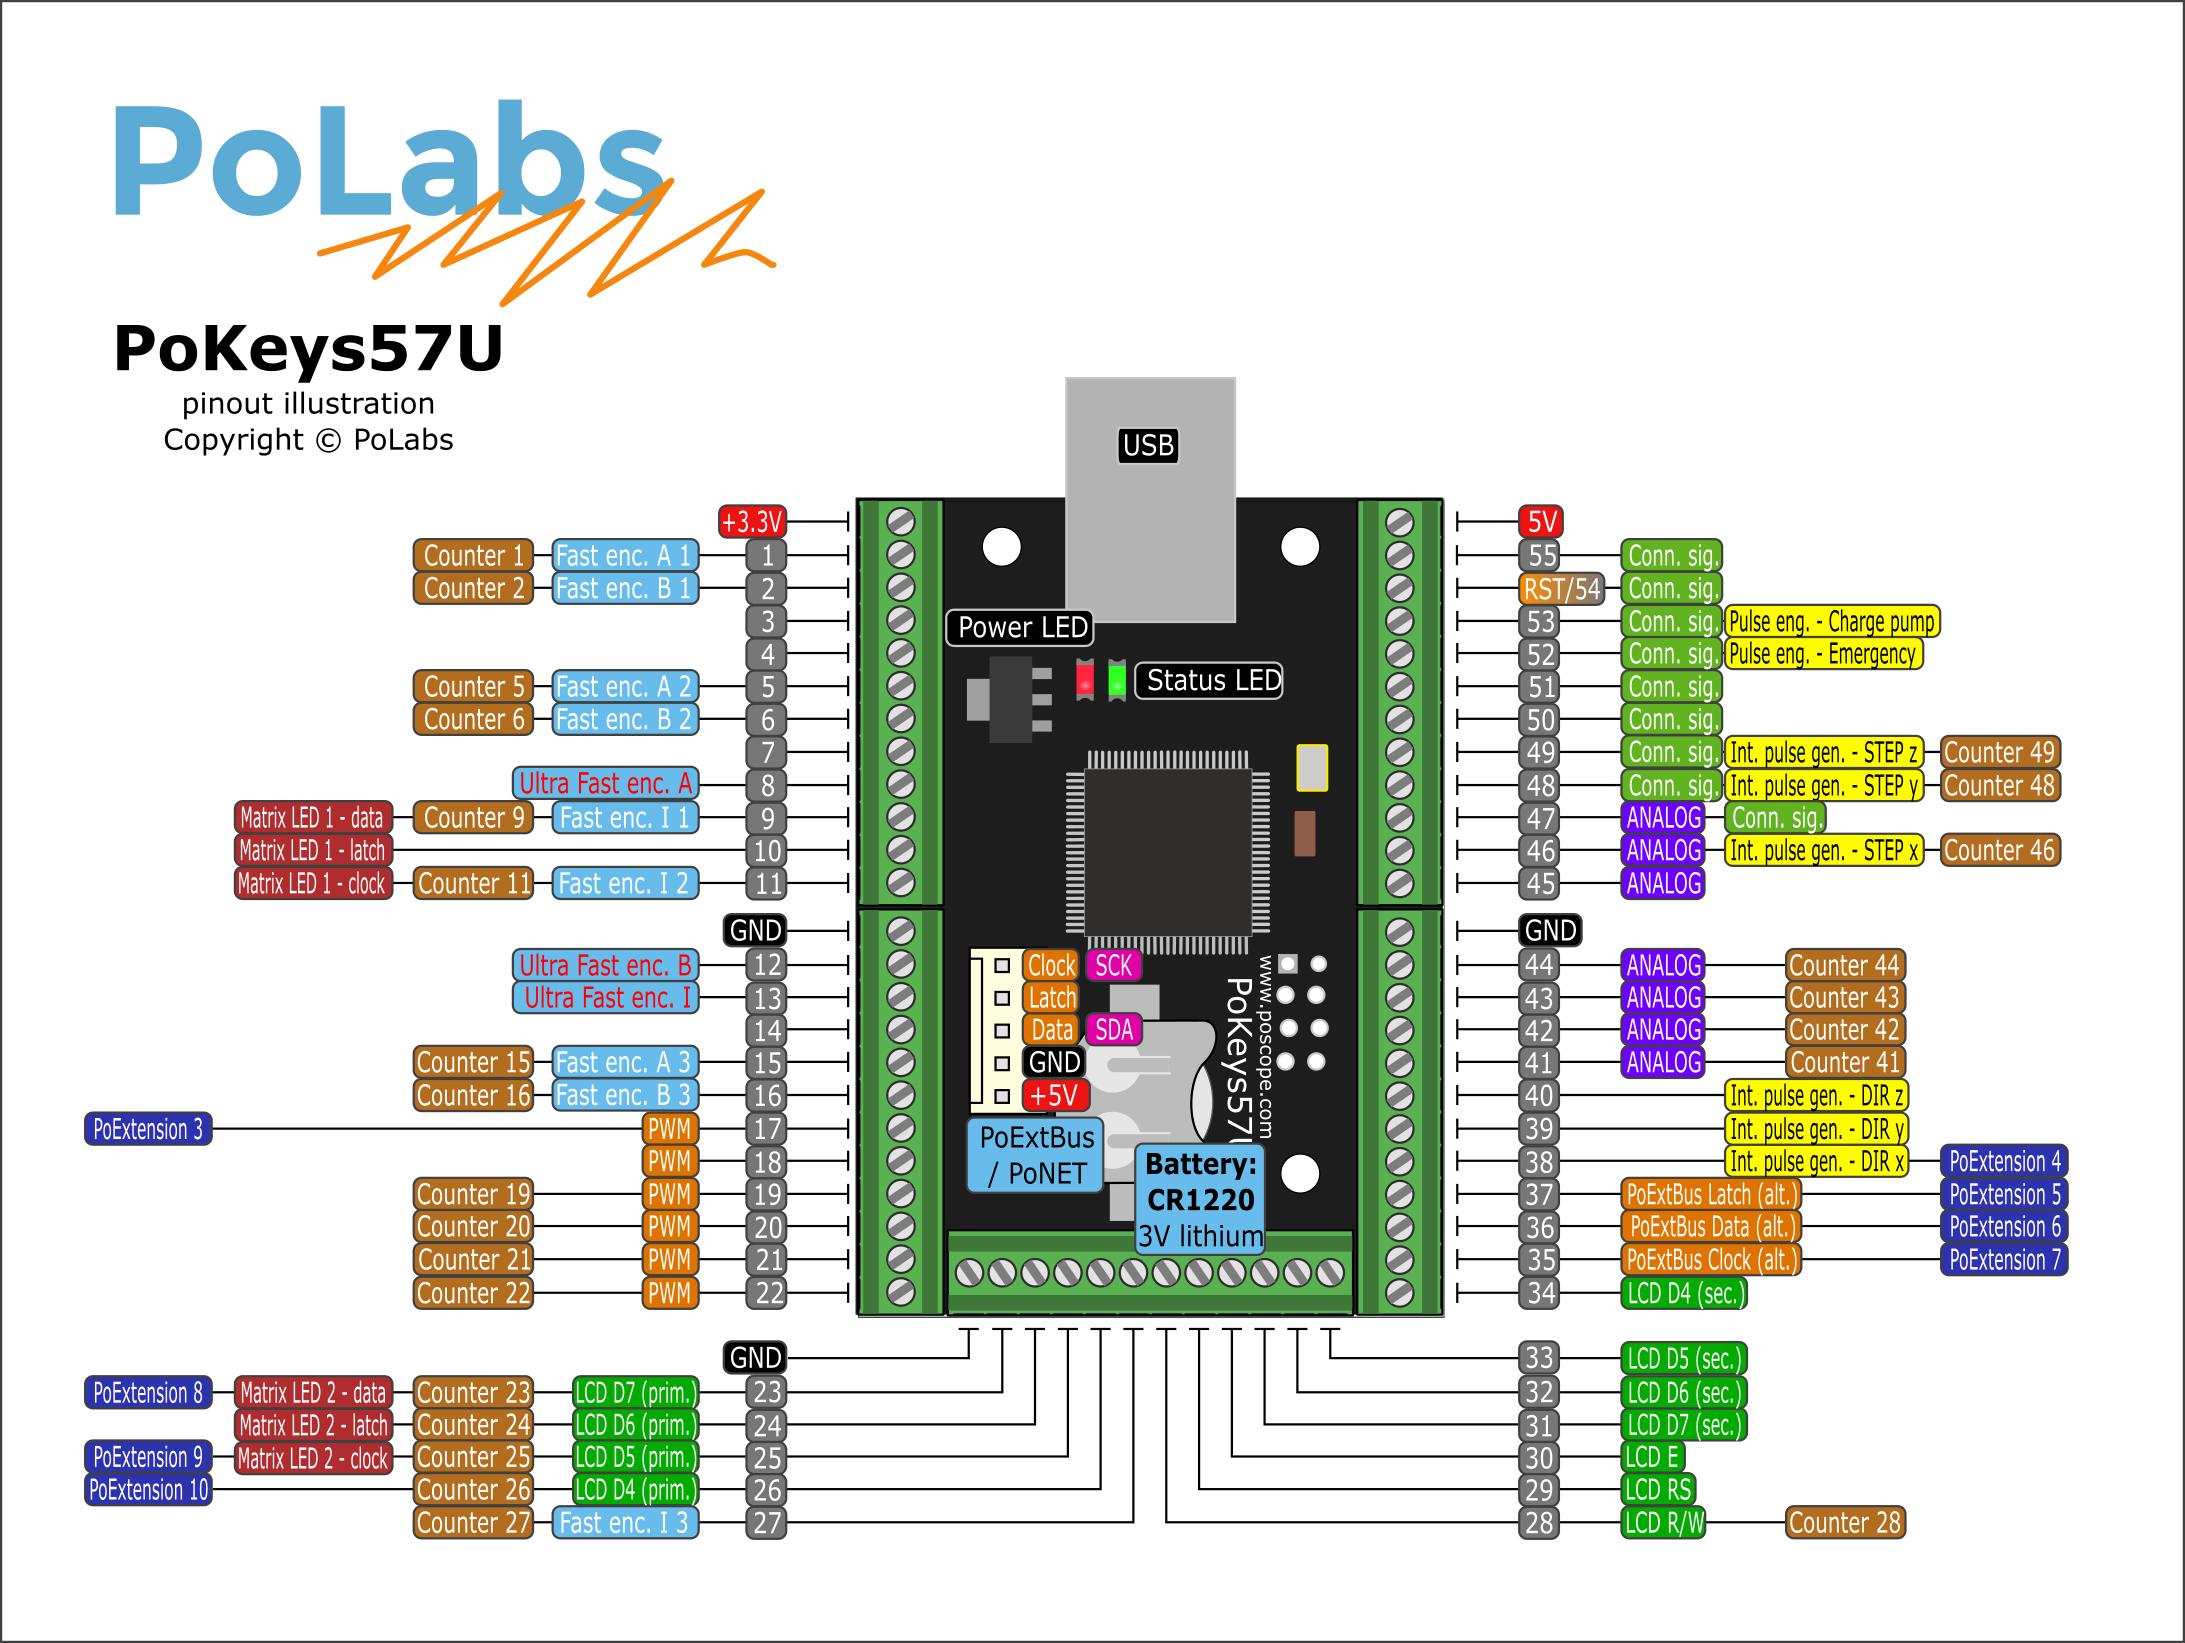 Usb Cnc Controller Pokeys57u Flight Simulators Automation Polabs Wiring Diagram Is And Universal Io Adapter Also Simulator Interface